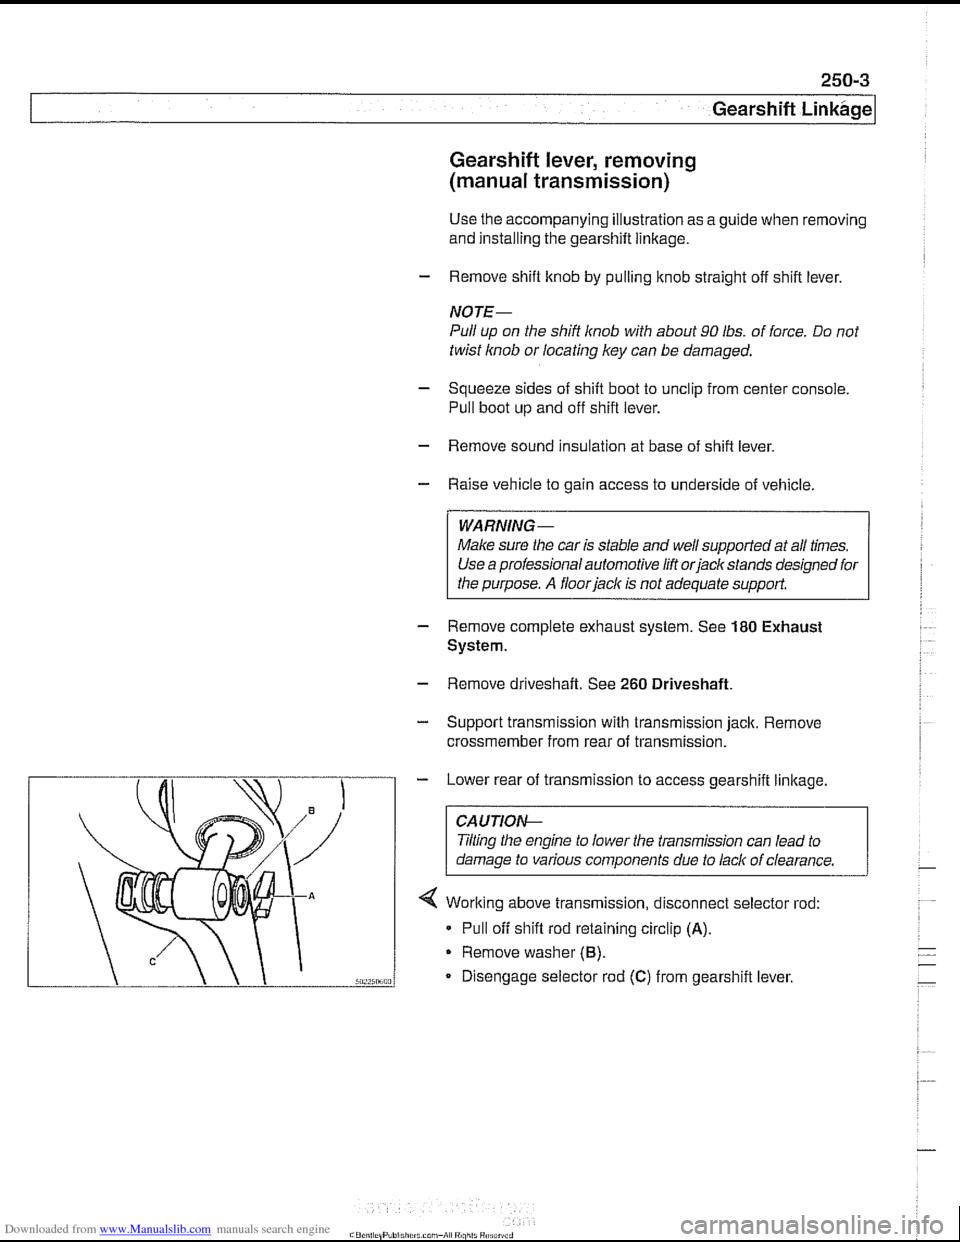 ... Array - bmw 530i 2001 e39 workshop manual rh carmanualsonline info ...